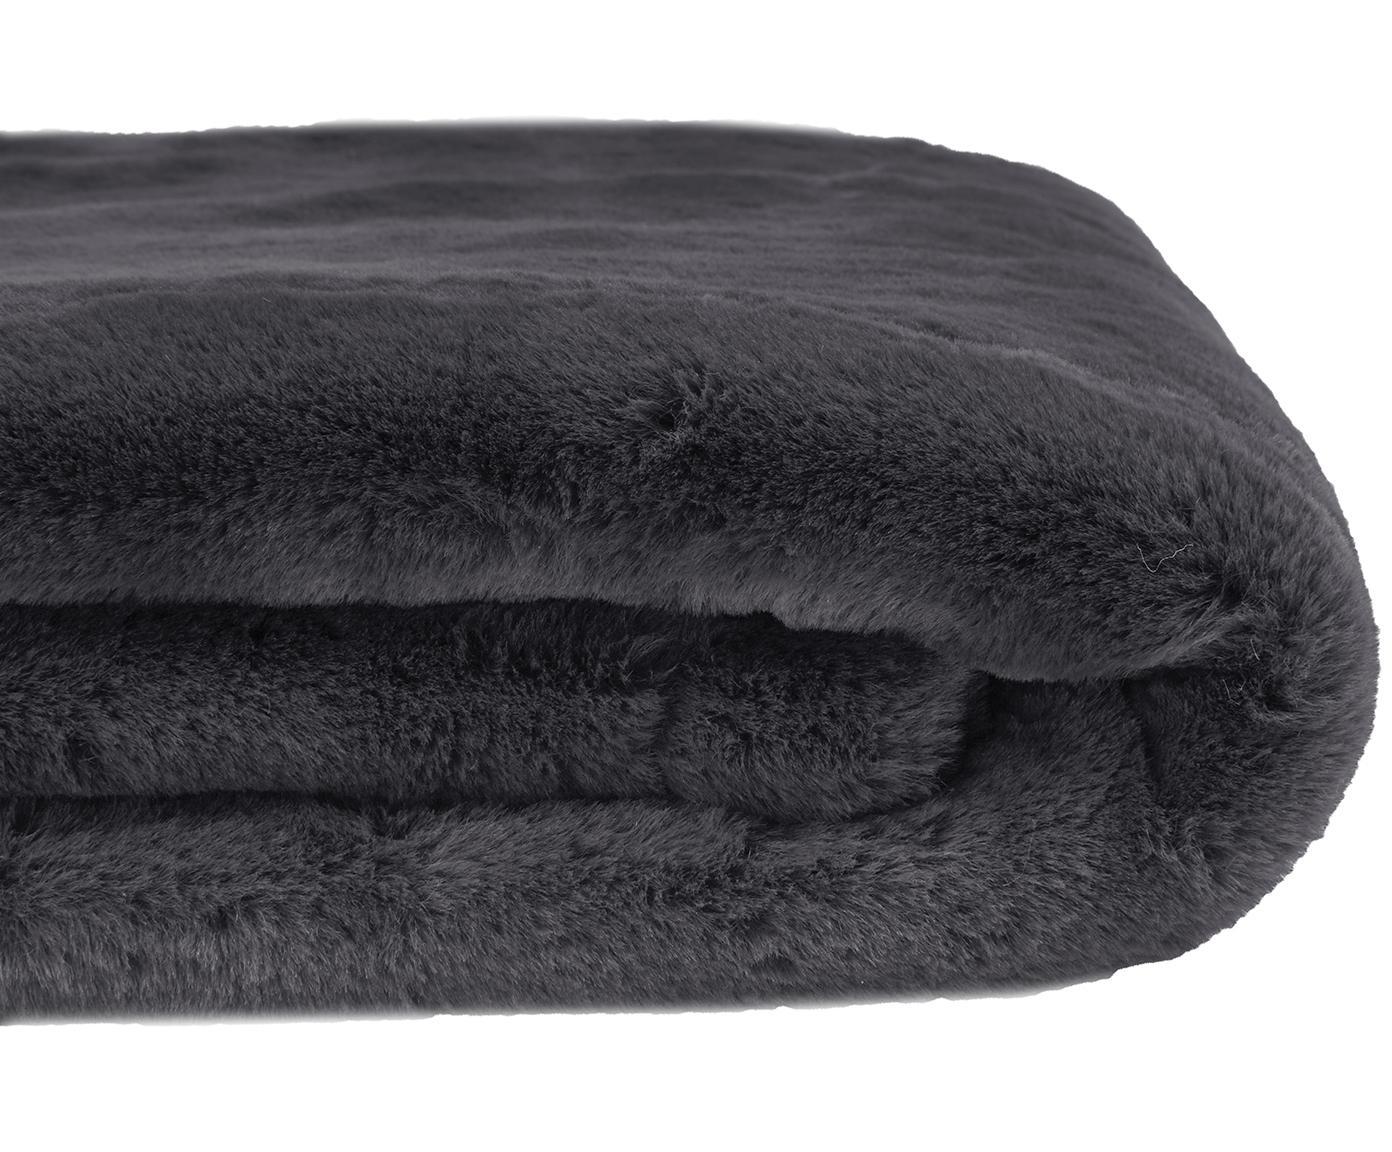 Kunstfell-Plaid Mette, glatt, Vorderseite: 100% Polyester, Rückseite: 100% Polyester, Dunkelgrau, 150 x 200 cm